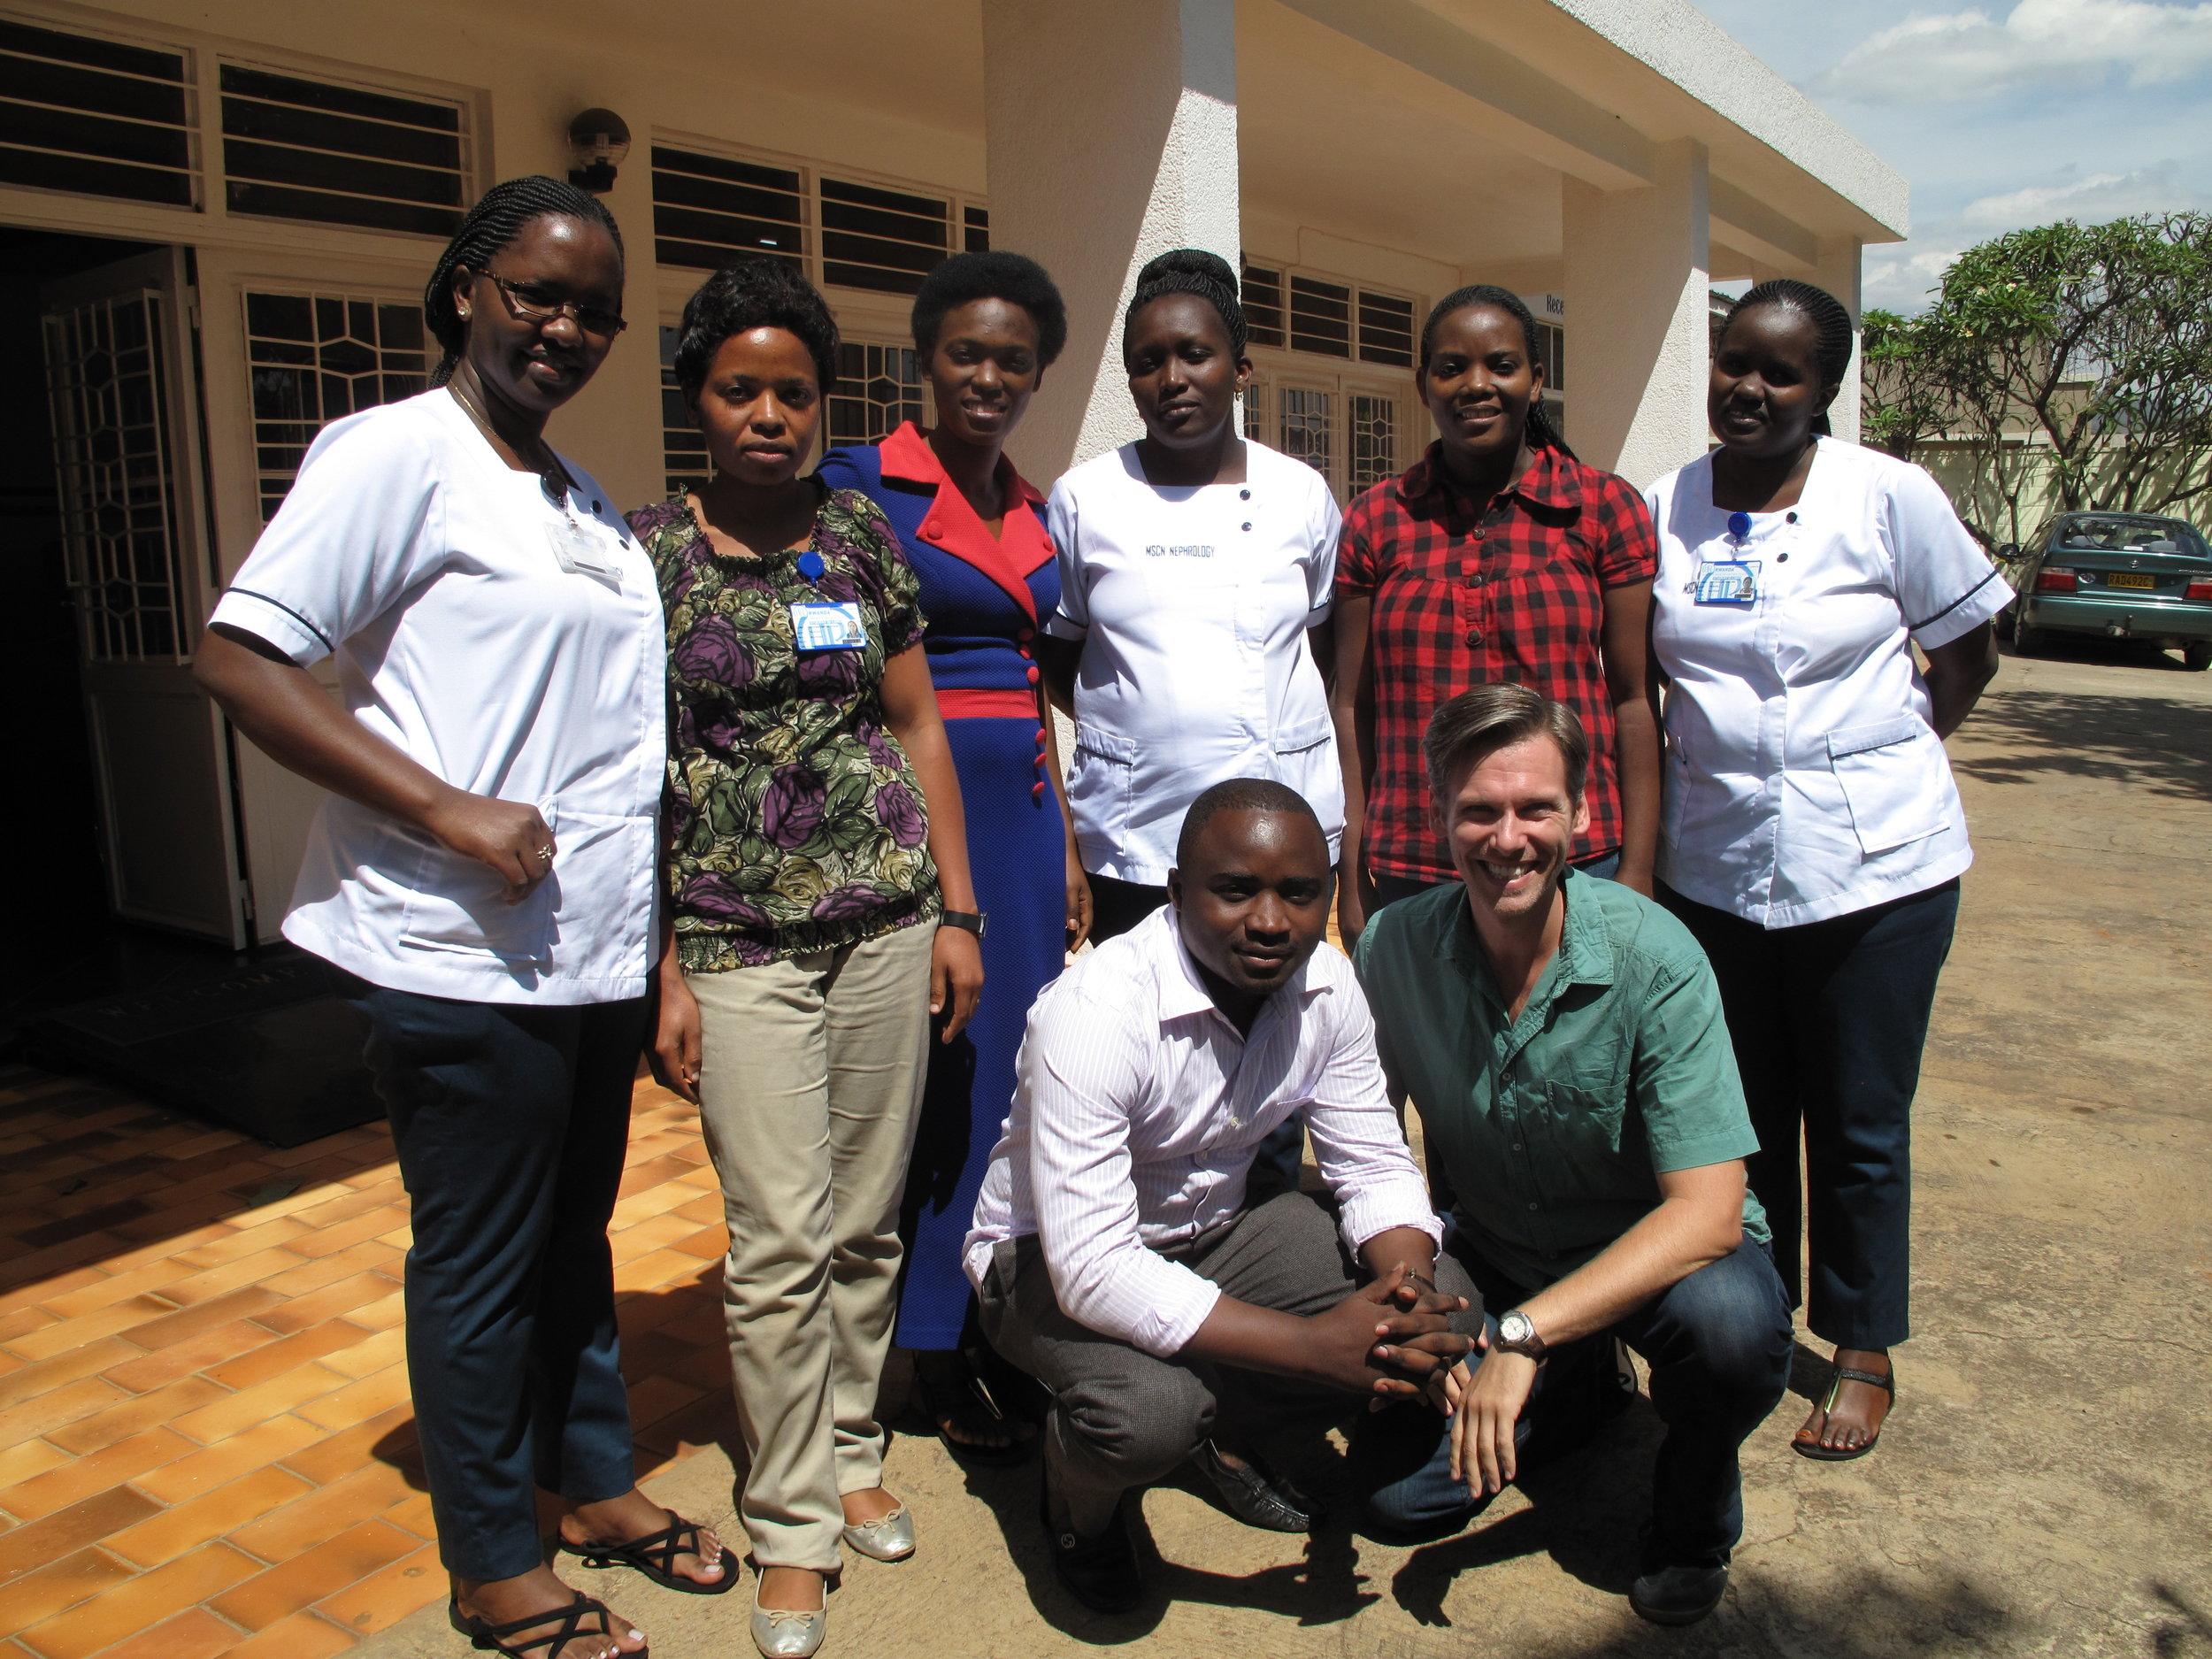 University of Rwanda Nephrology MSN students, Kigali, Rwanda. Spring 2016.